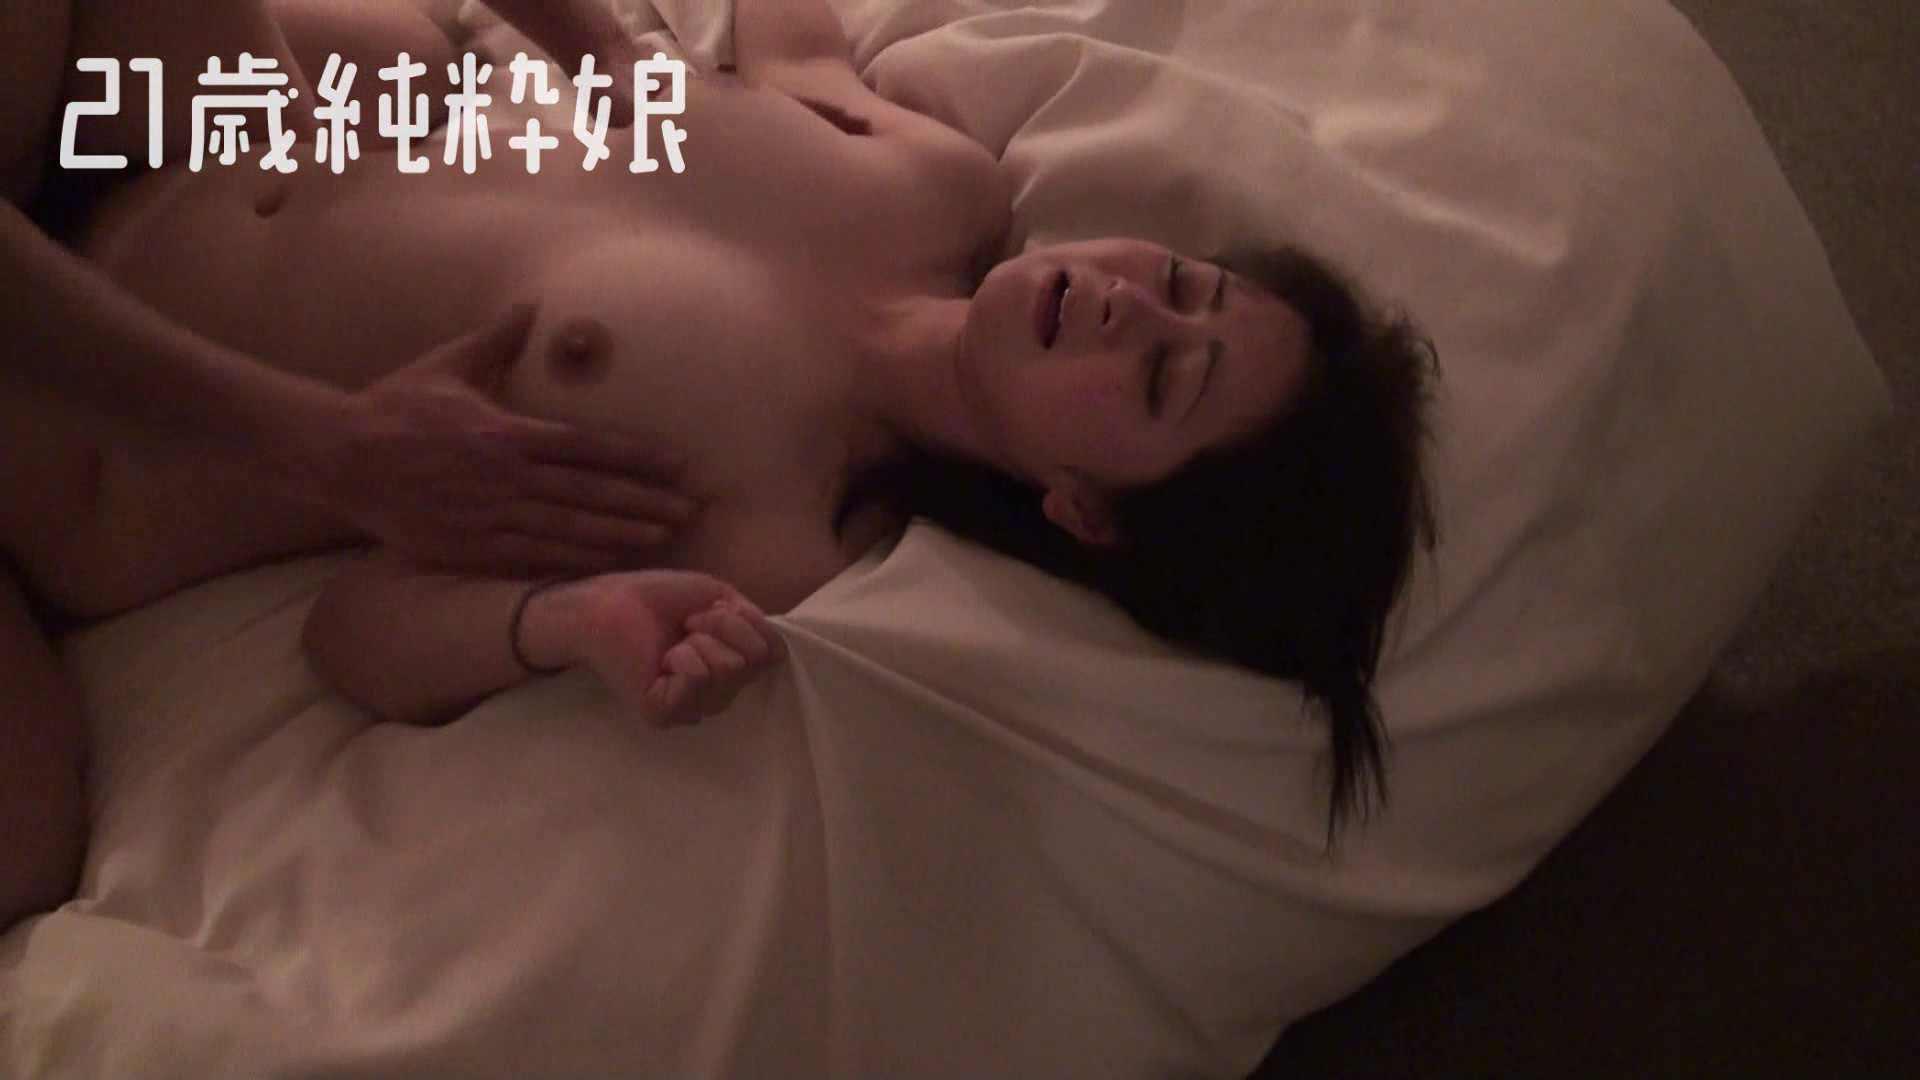 Gカップ21歳純粋嬢第2弾Vol.4 OL裸体 | 学校  65画像 56